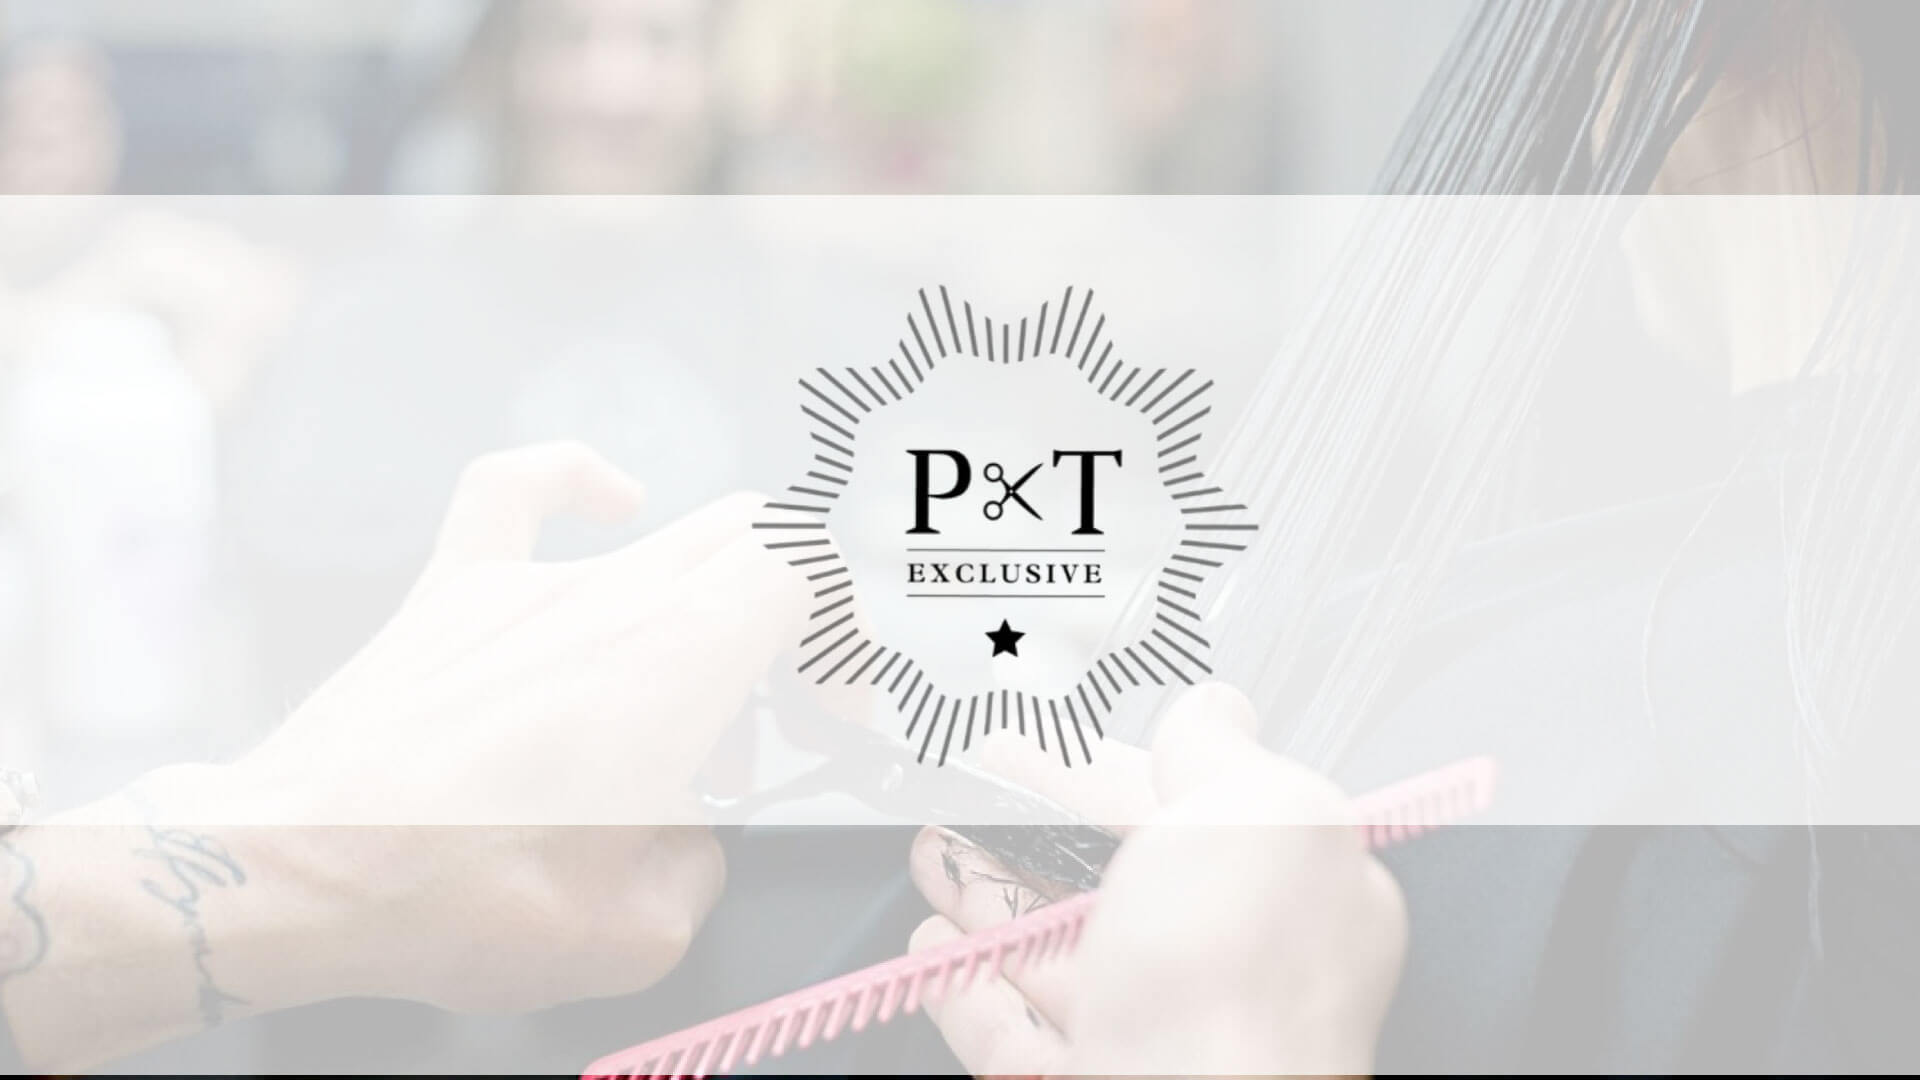 P&T Exclusive